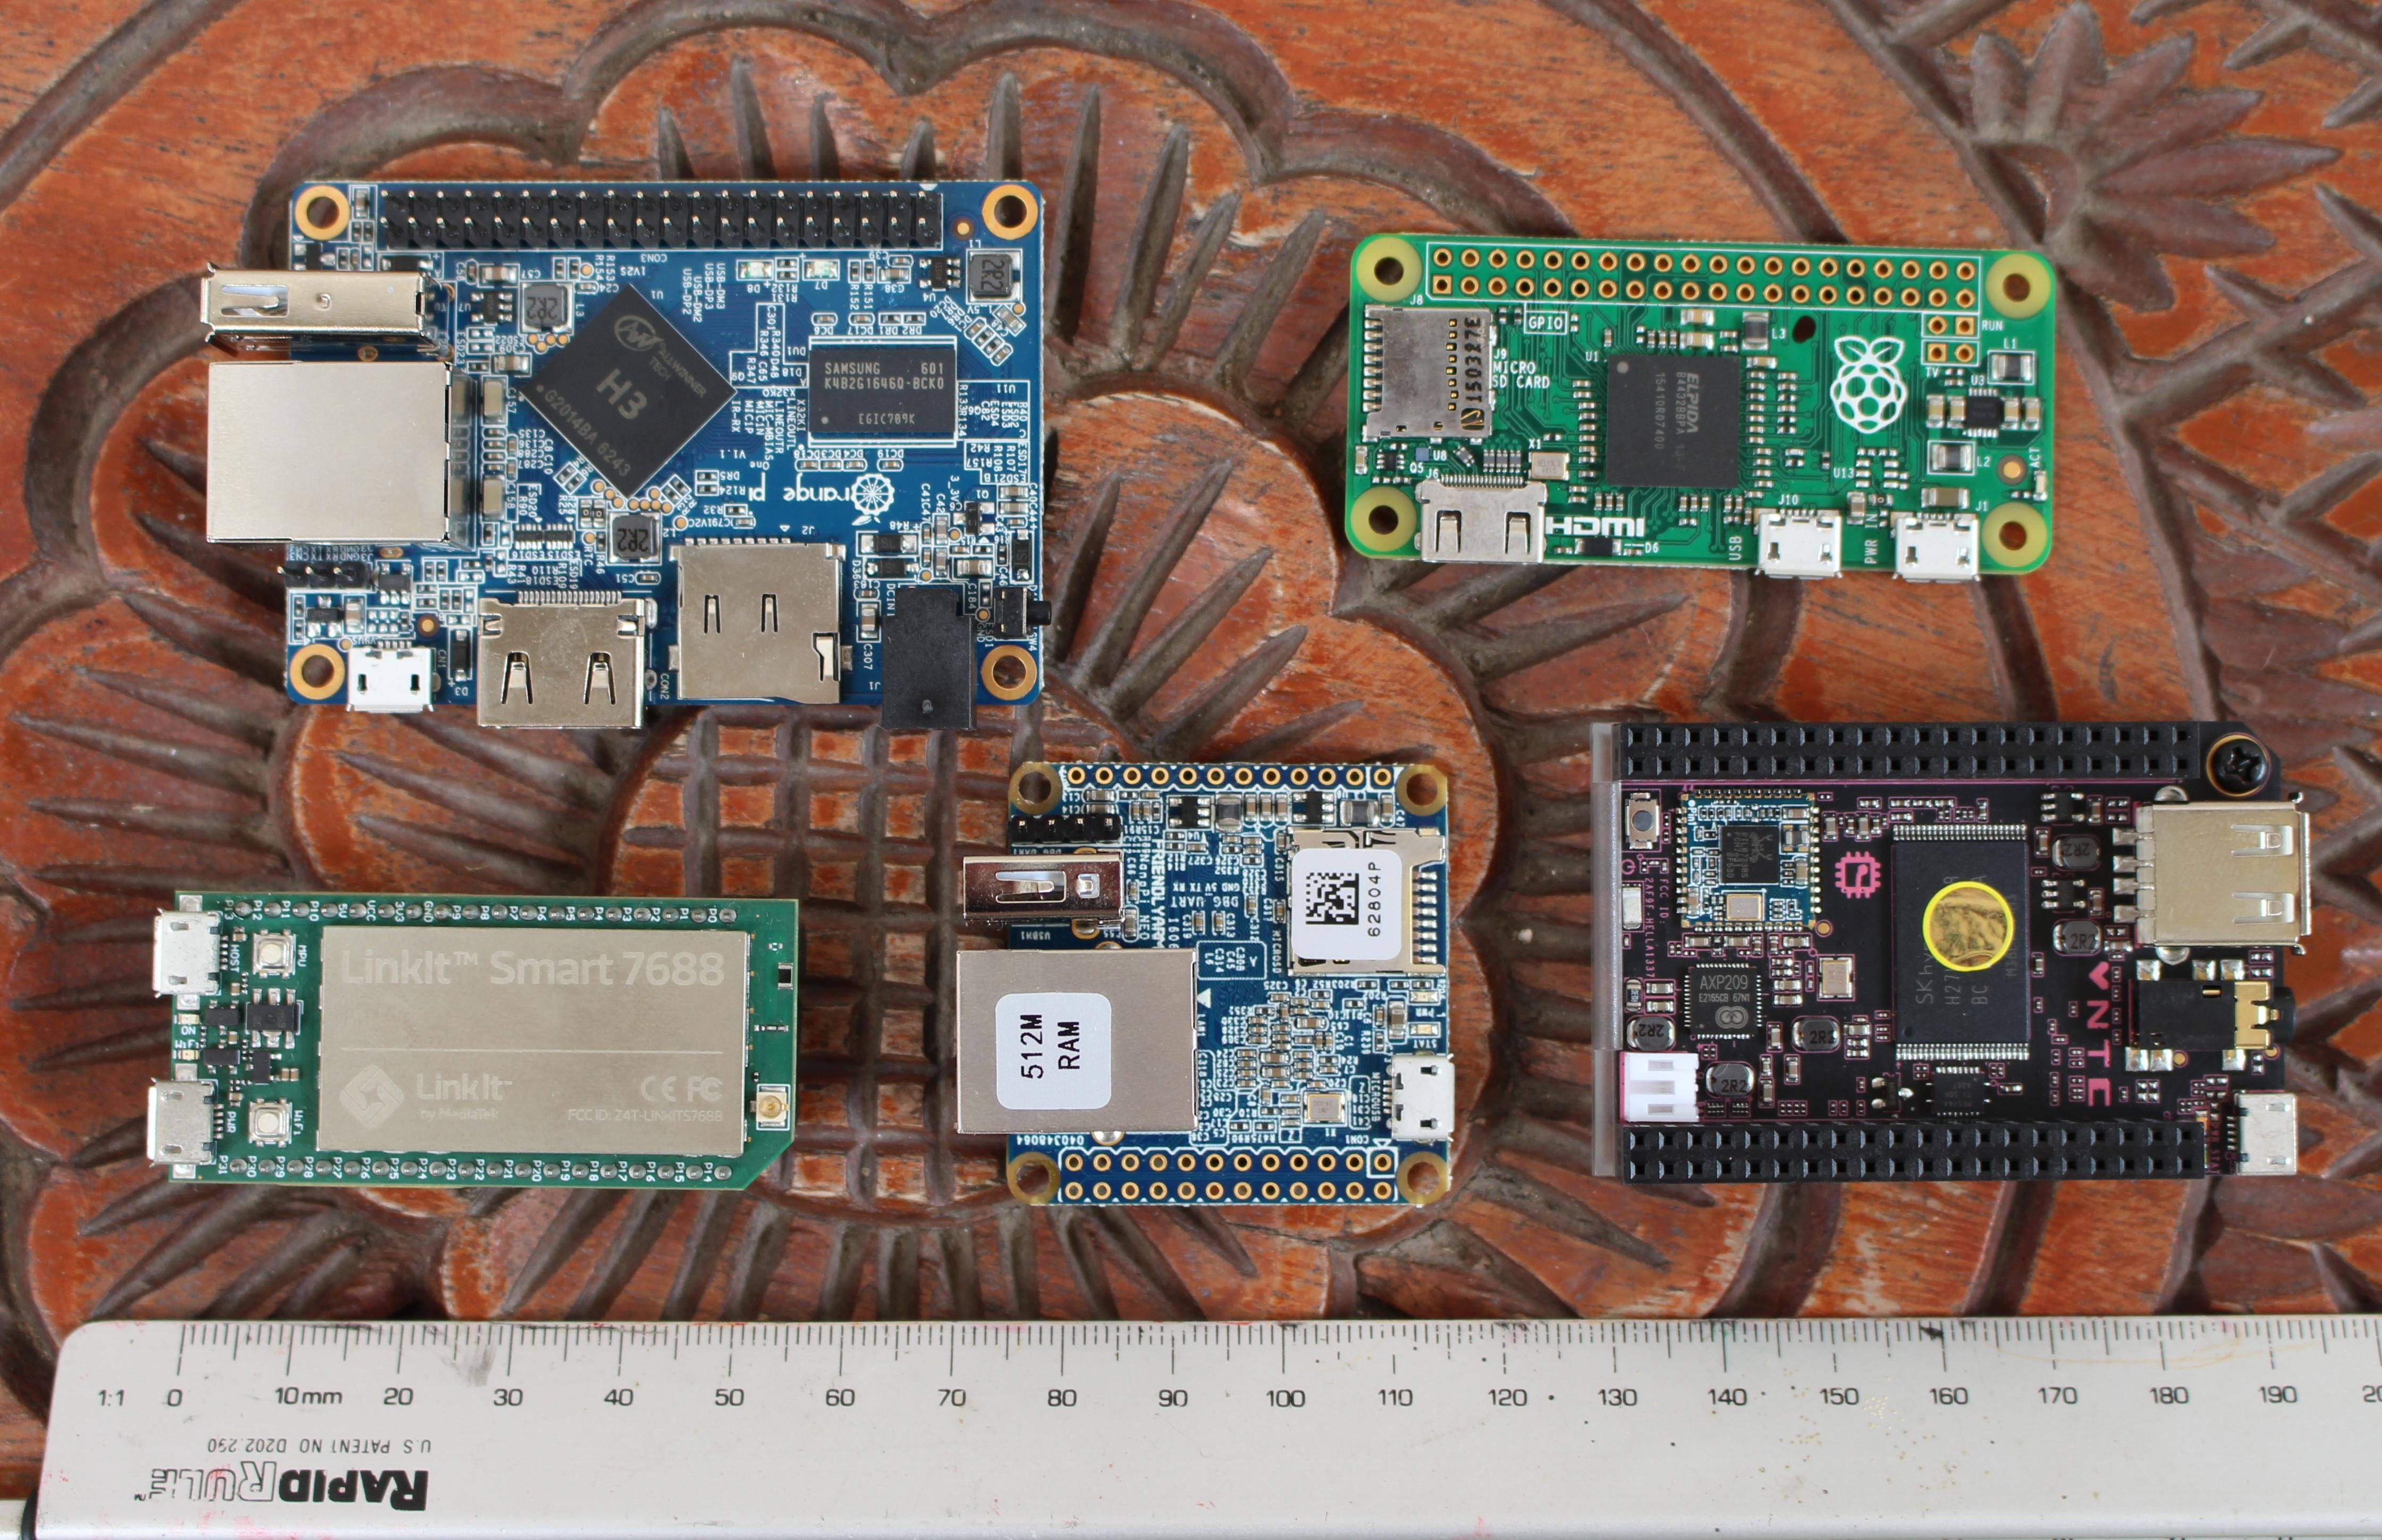 Getting Started with NanoPi NEO Development Board - Ubuntu